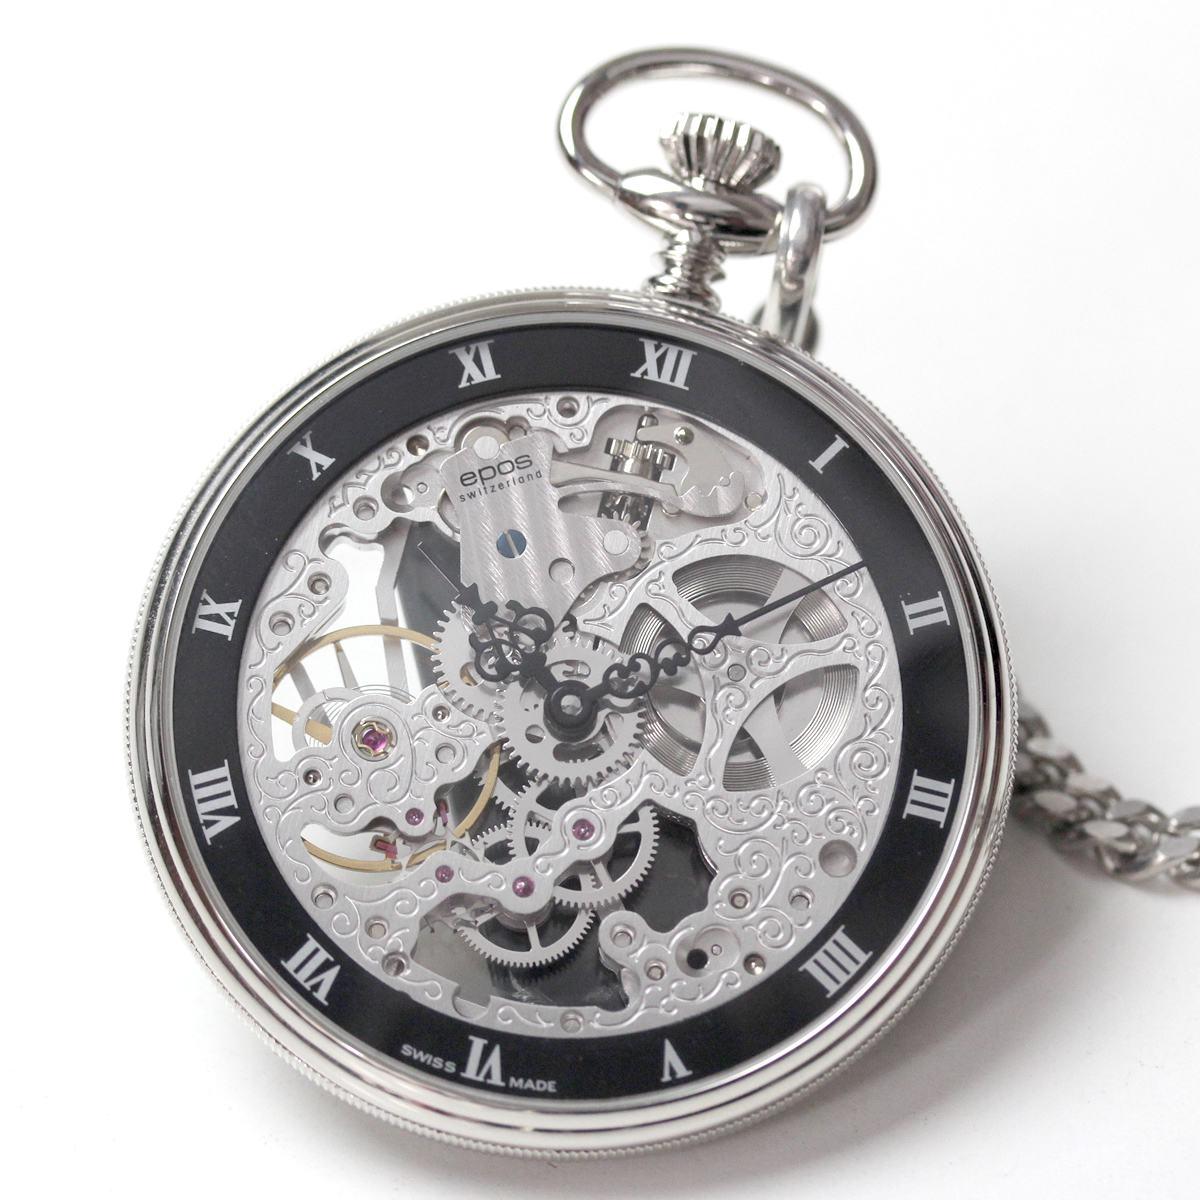 epos エポス懐中時計 フルスケルトン 2089